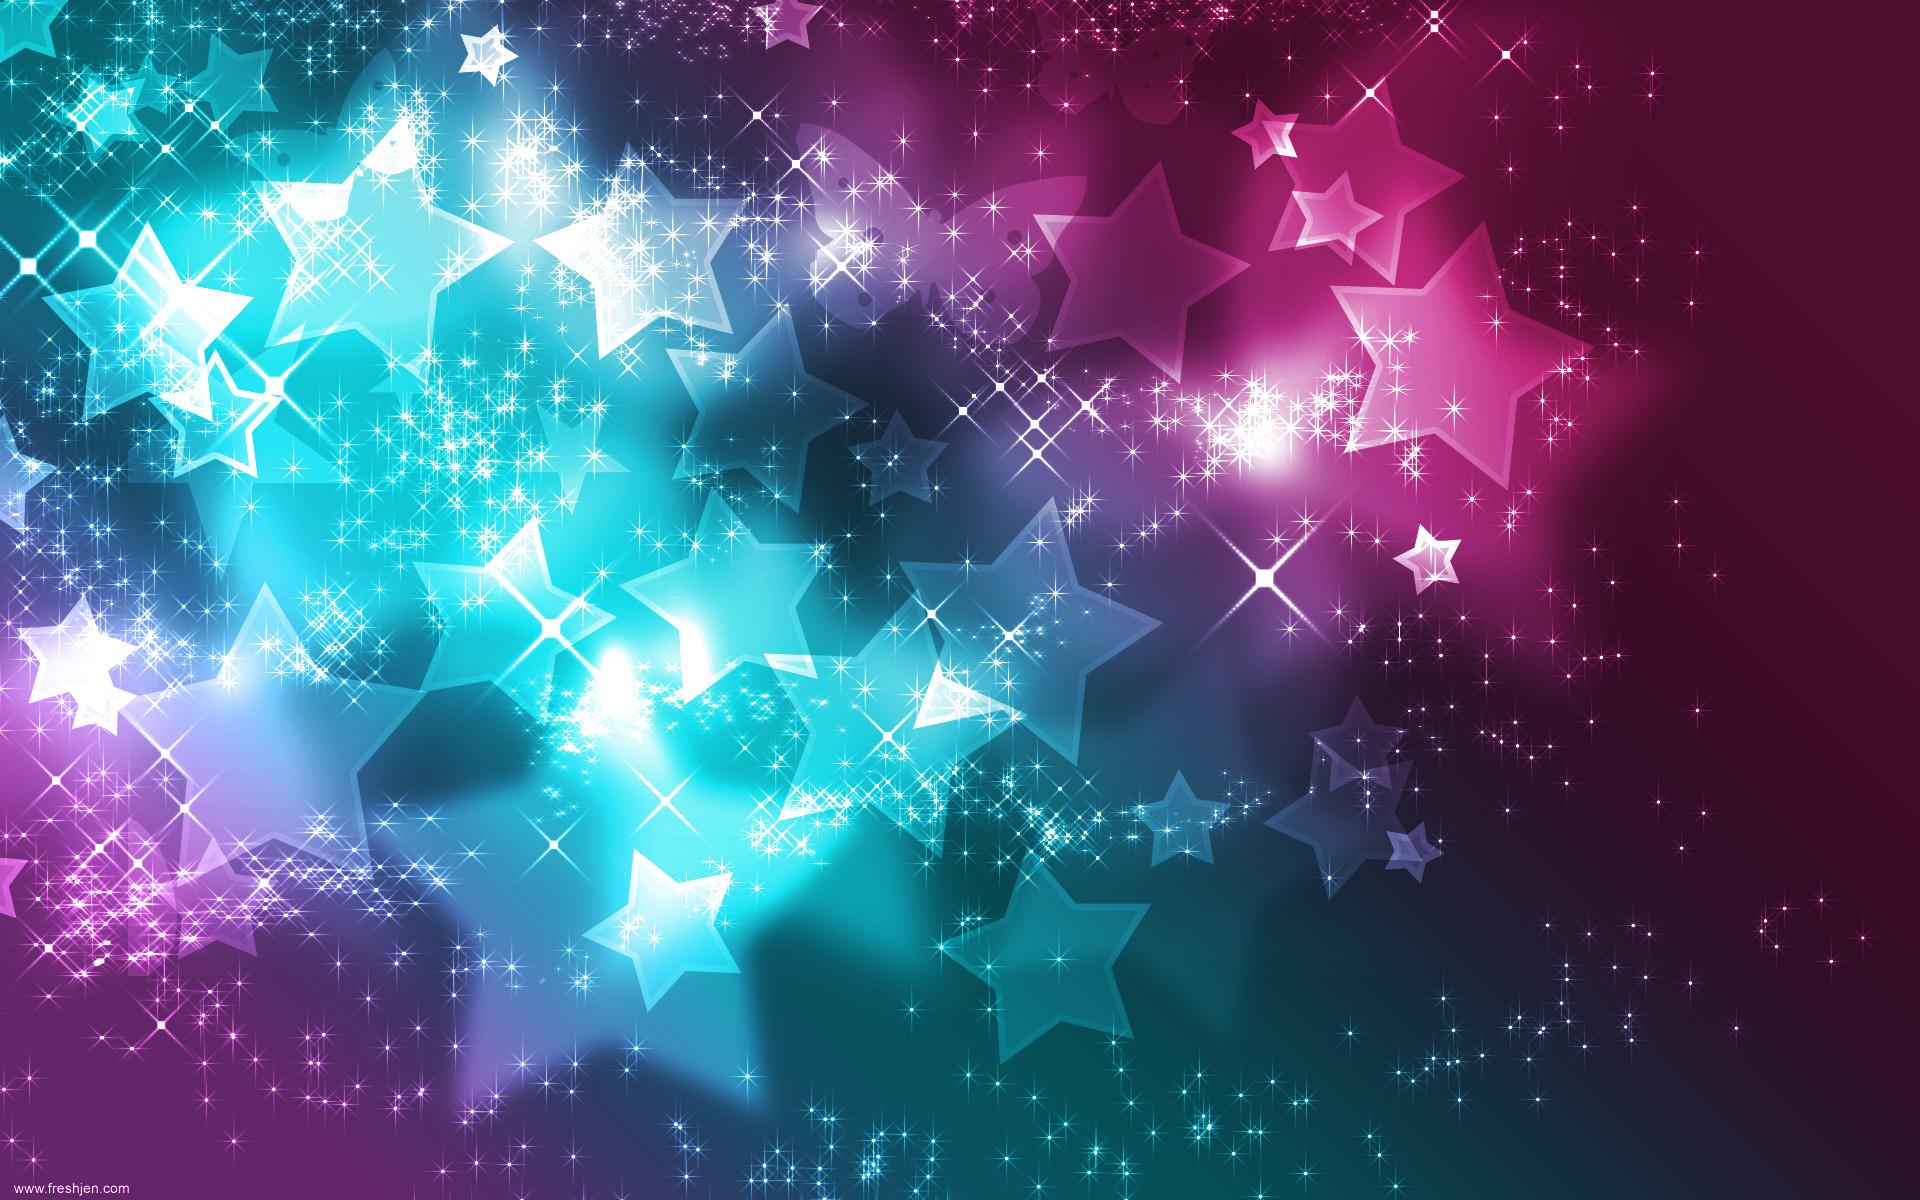 Sparkly Stars